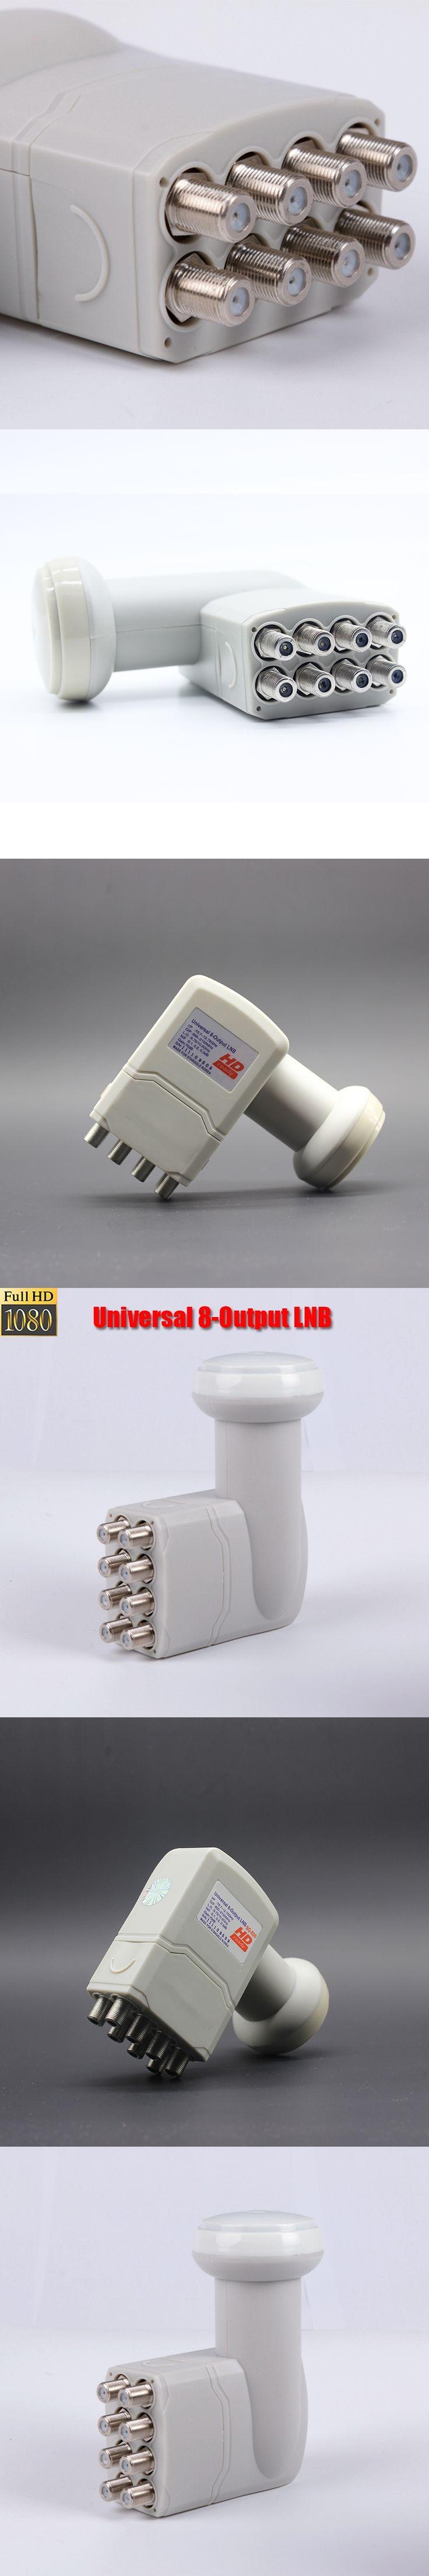 Universal 8 output lnb Extra high quality digital reception lnb for satellite tv dvbs2 ku band lnb universal ku band 8 lnb